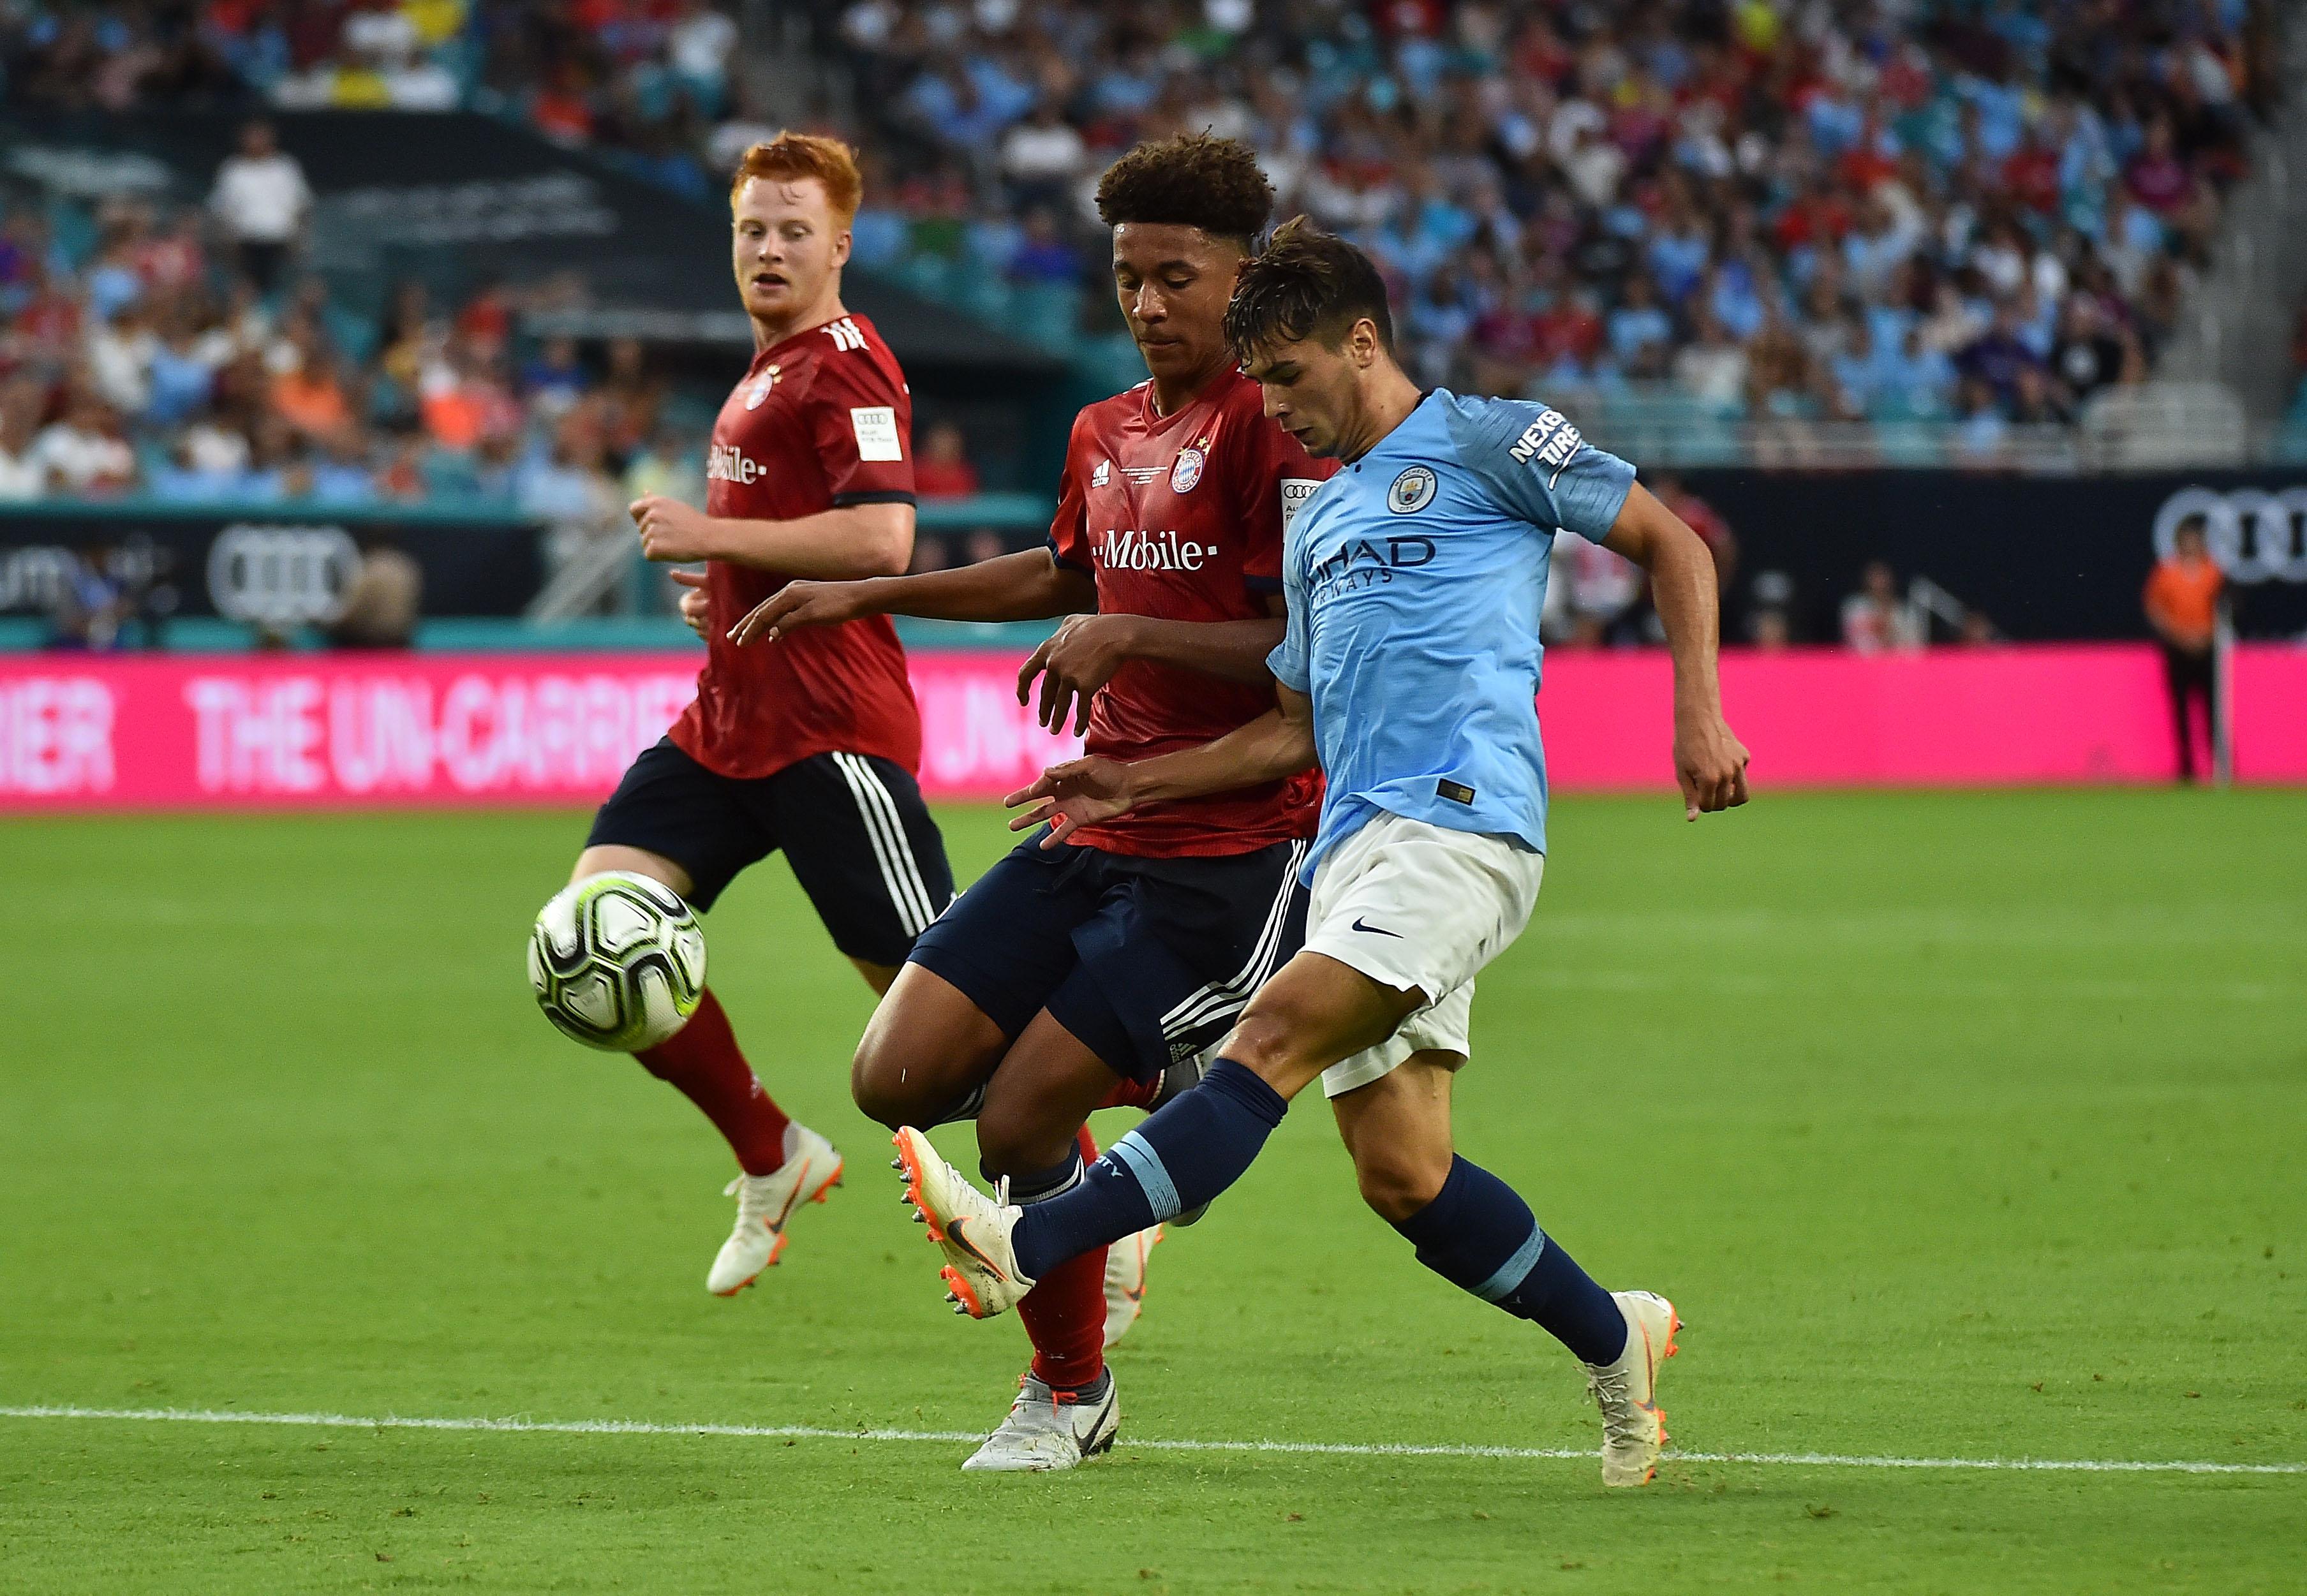 Soccer: International Champions Cup-FC Bayern at Manchester City